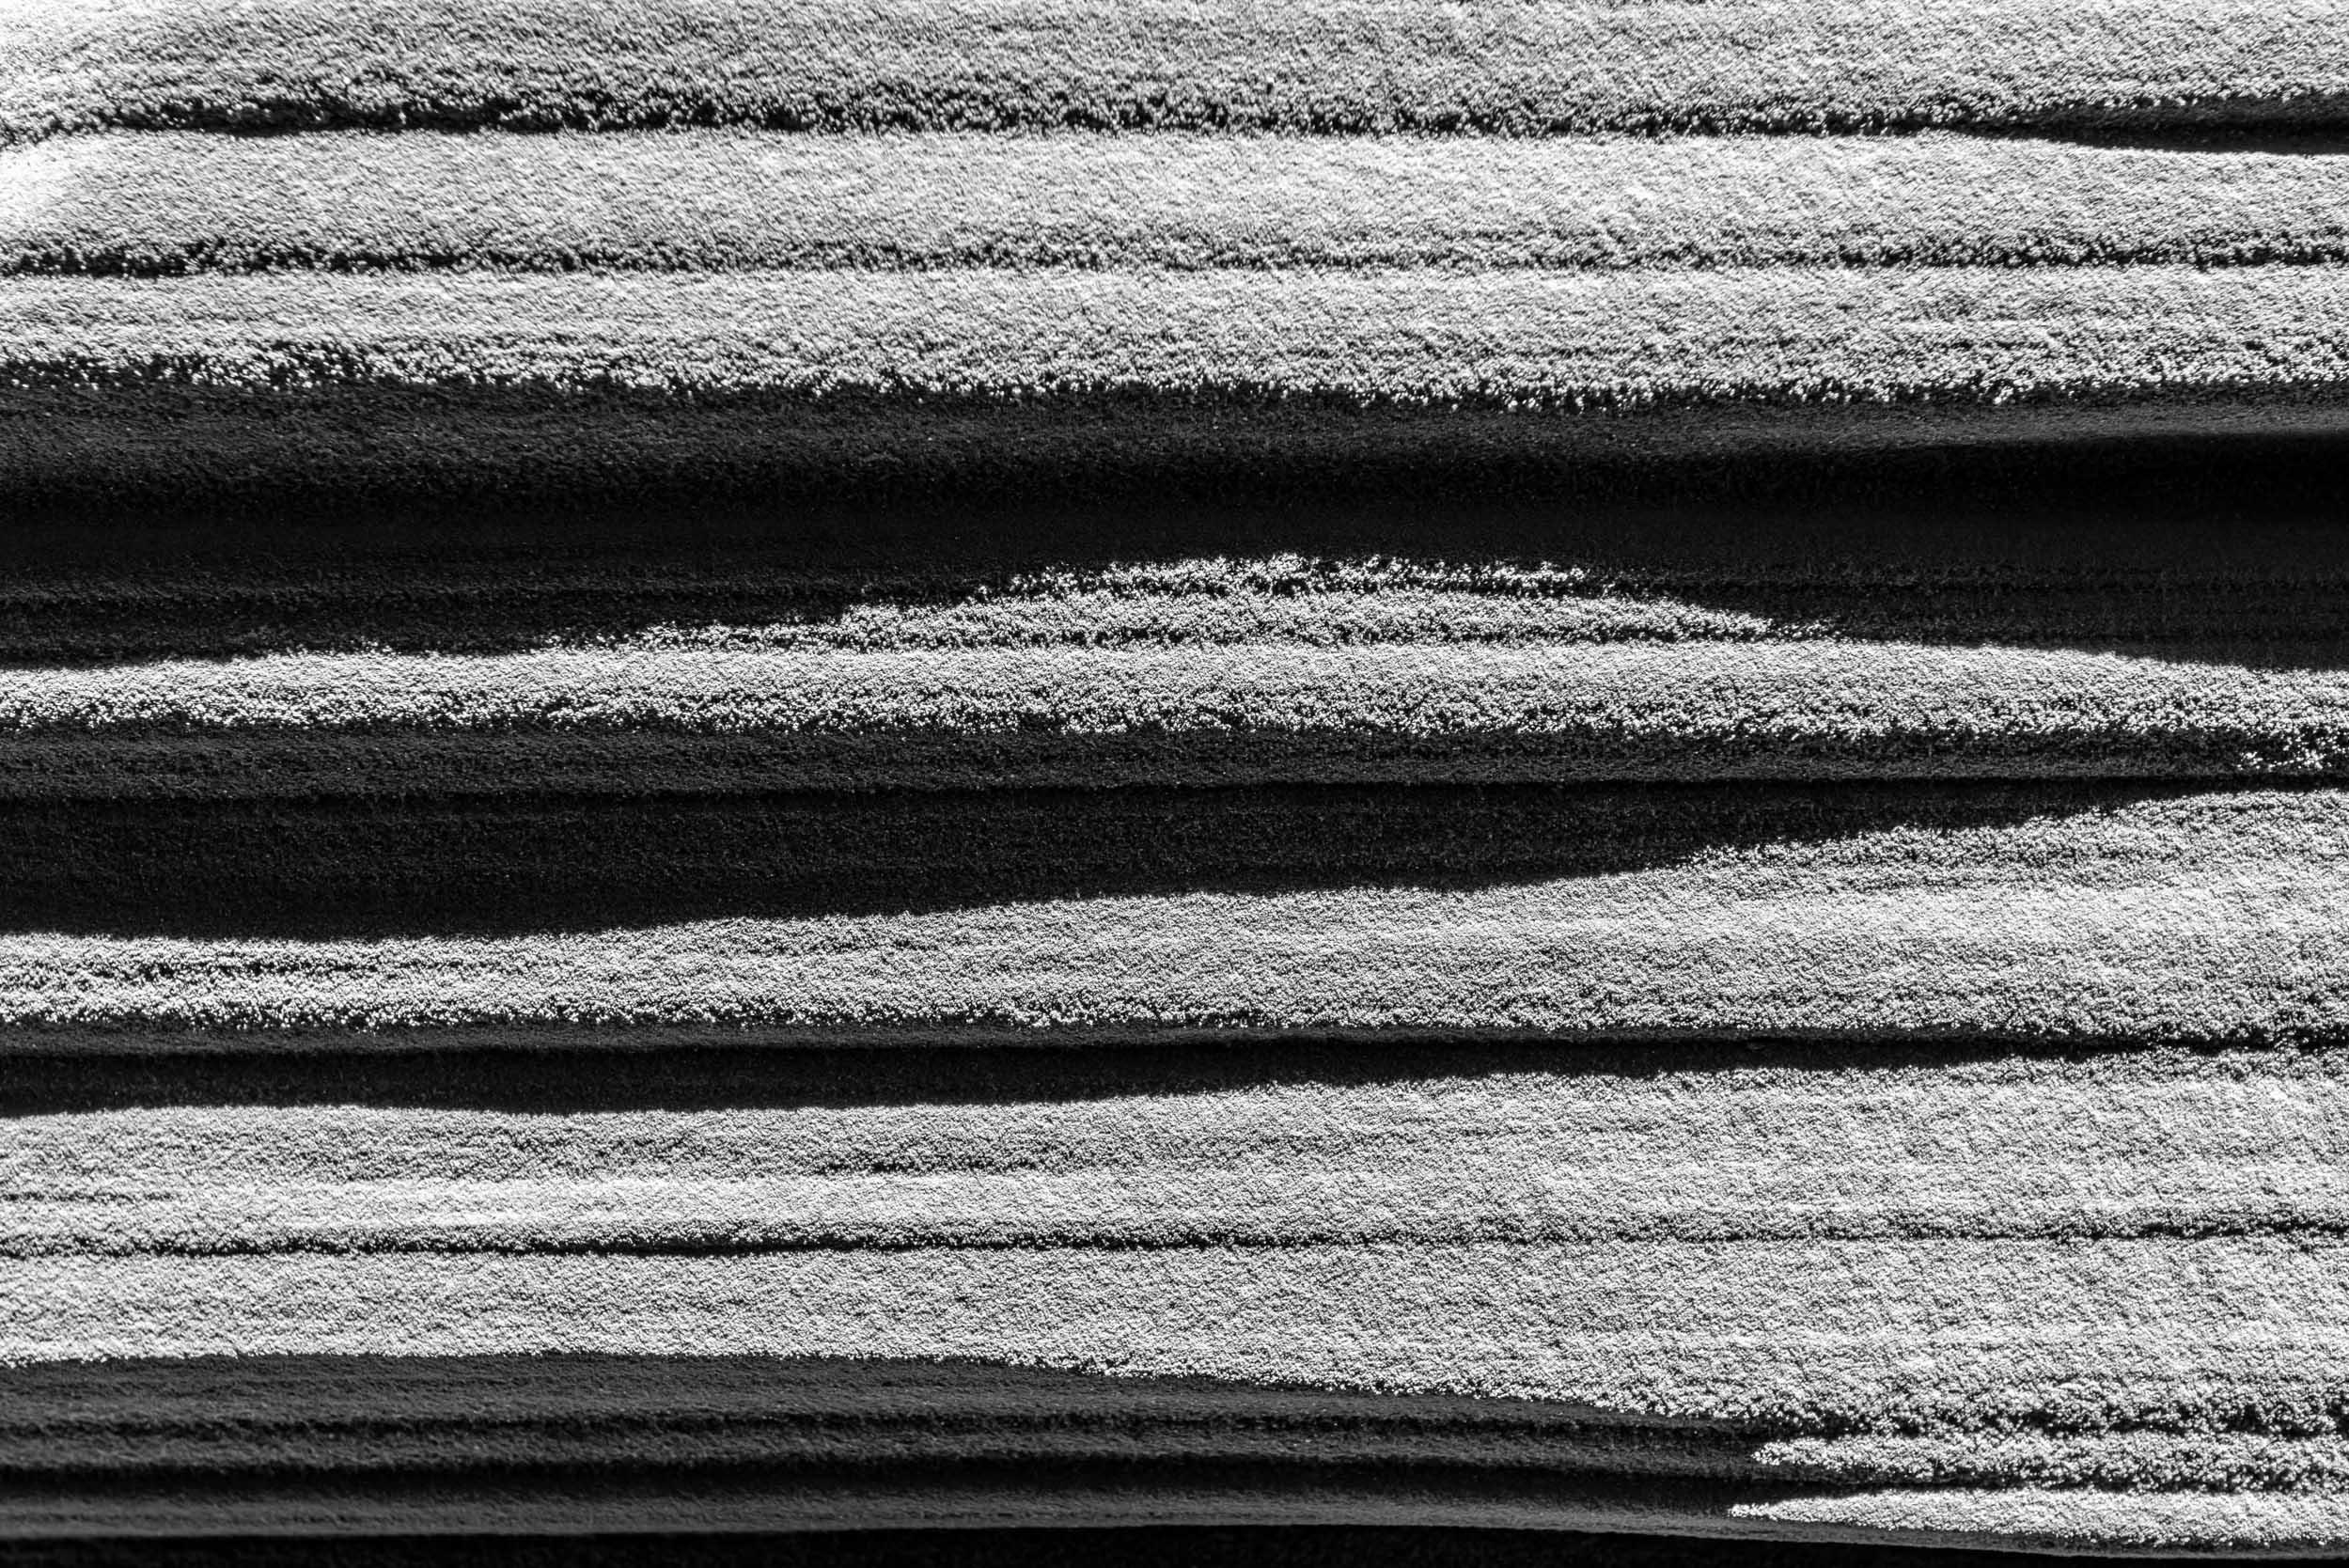 Sand Patterns-4.jpg